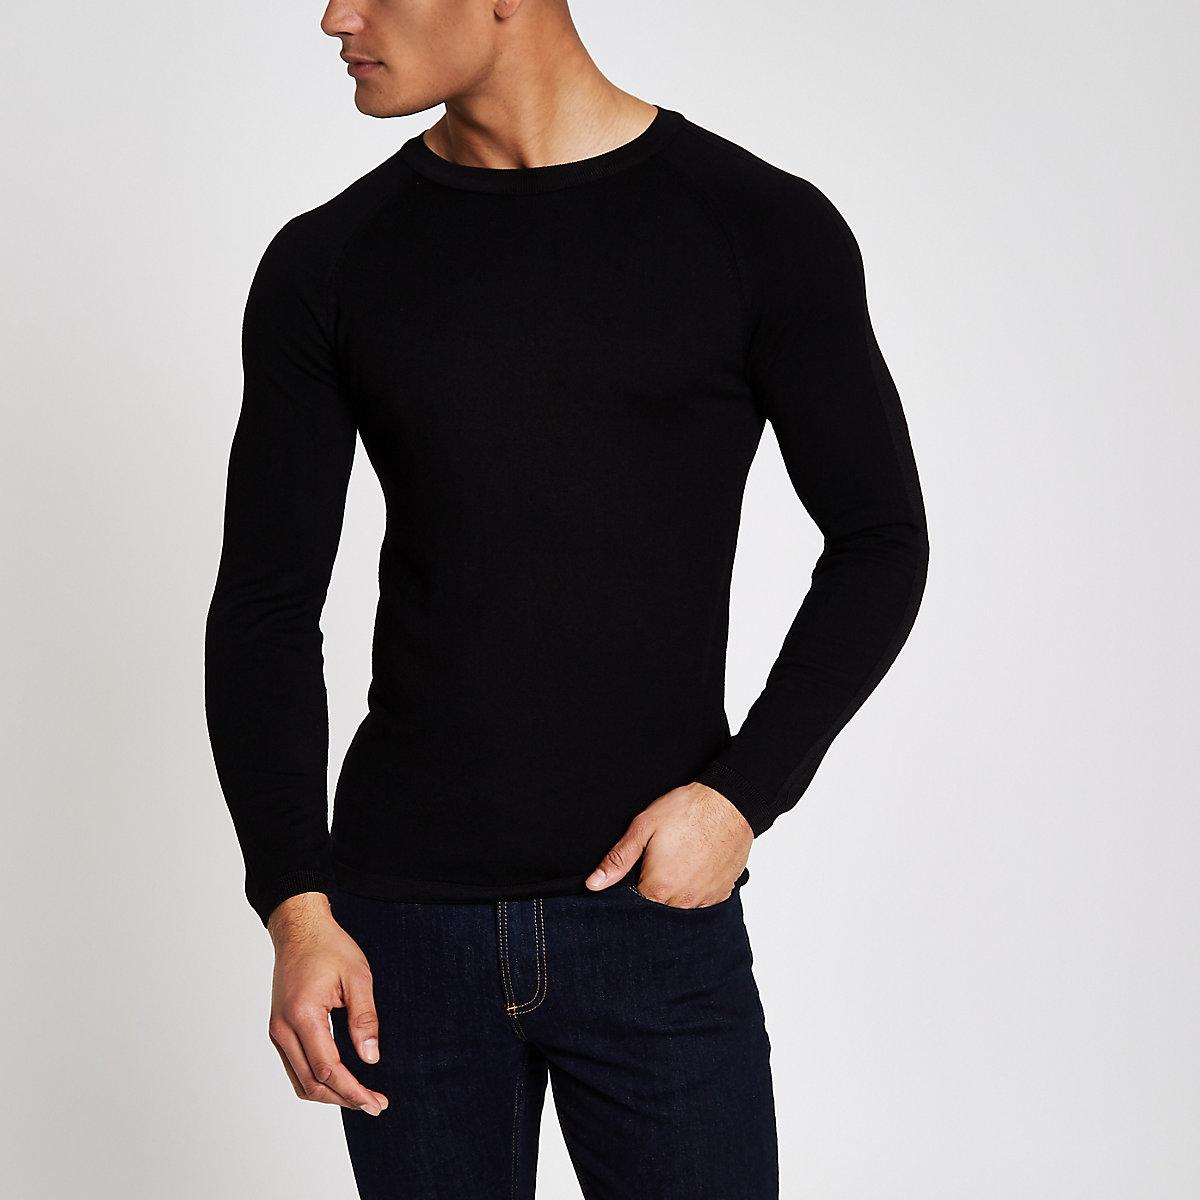 Black muscle fit crew neck jumper